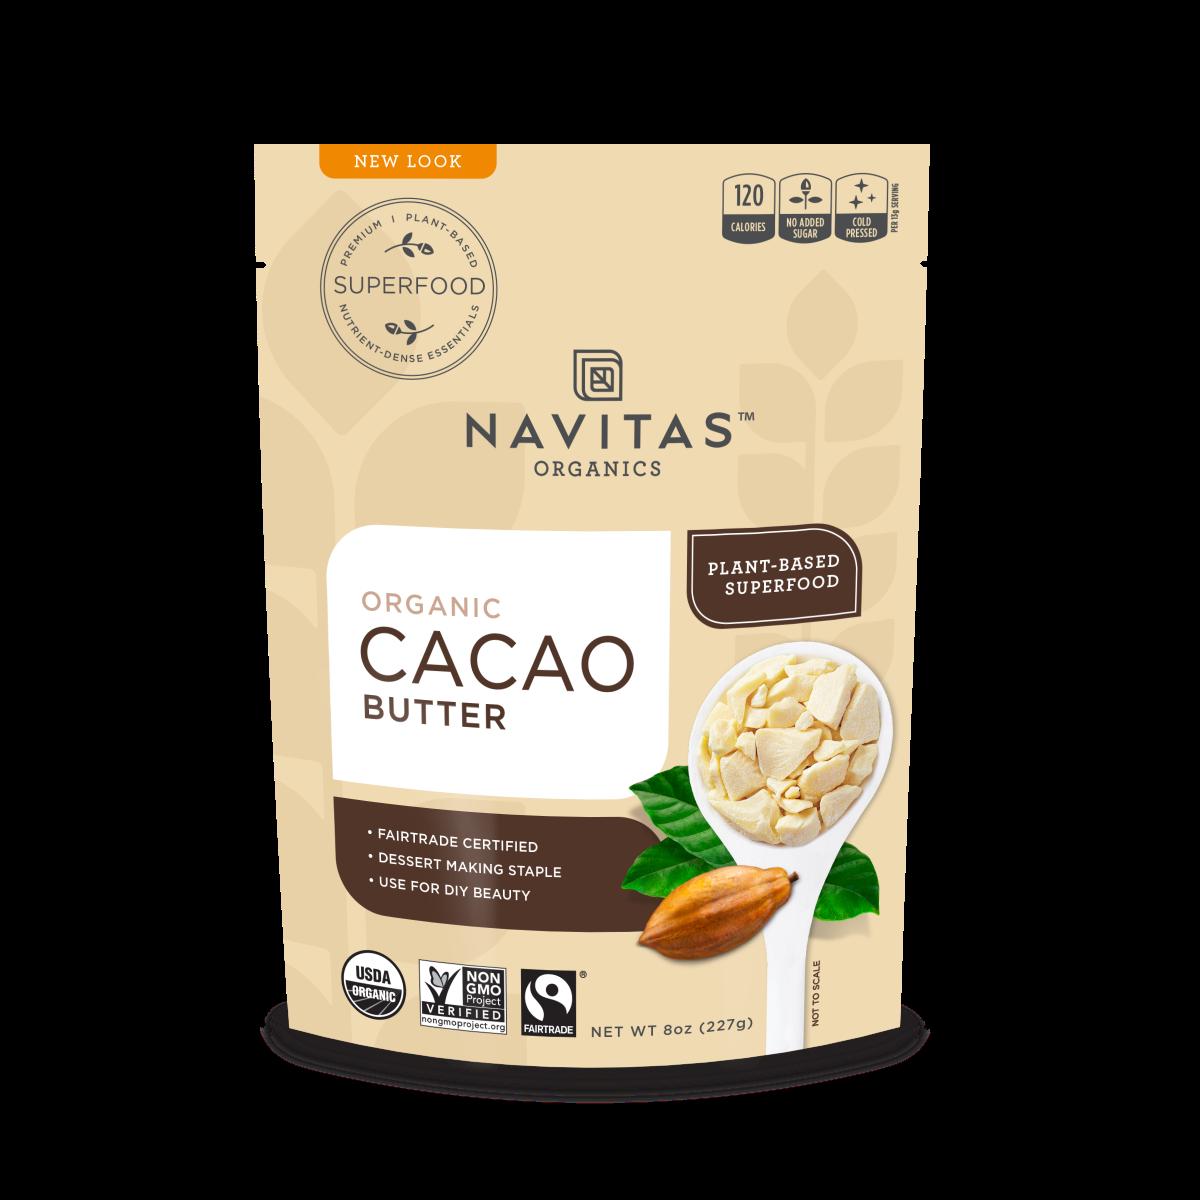 2017-cacao-butter-8oz-fop-3d.png